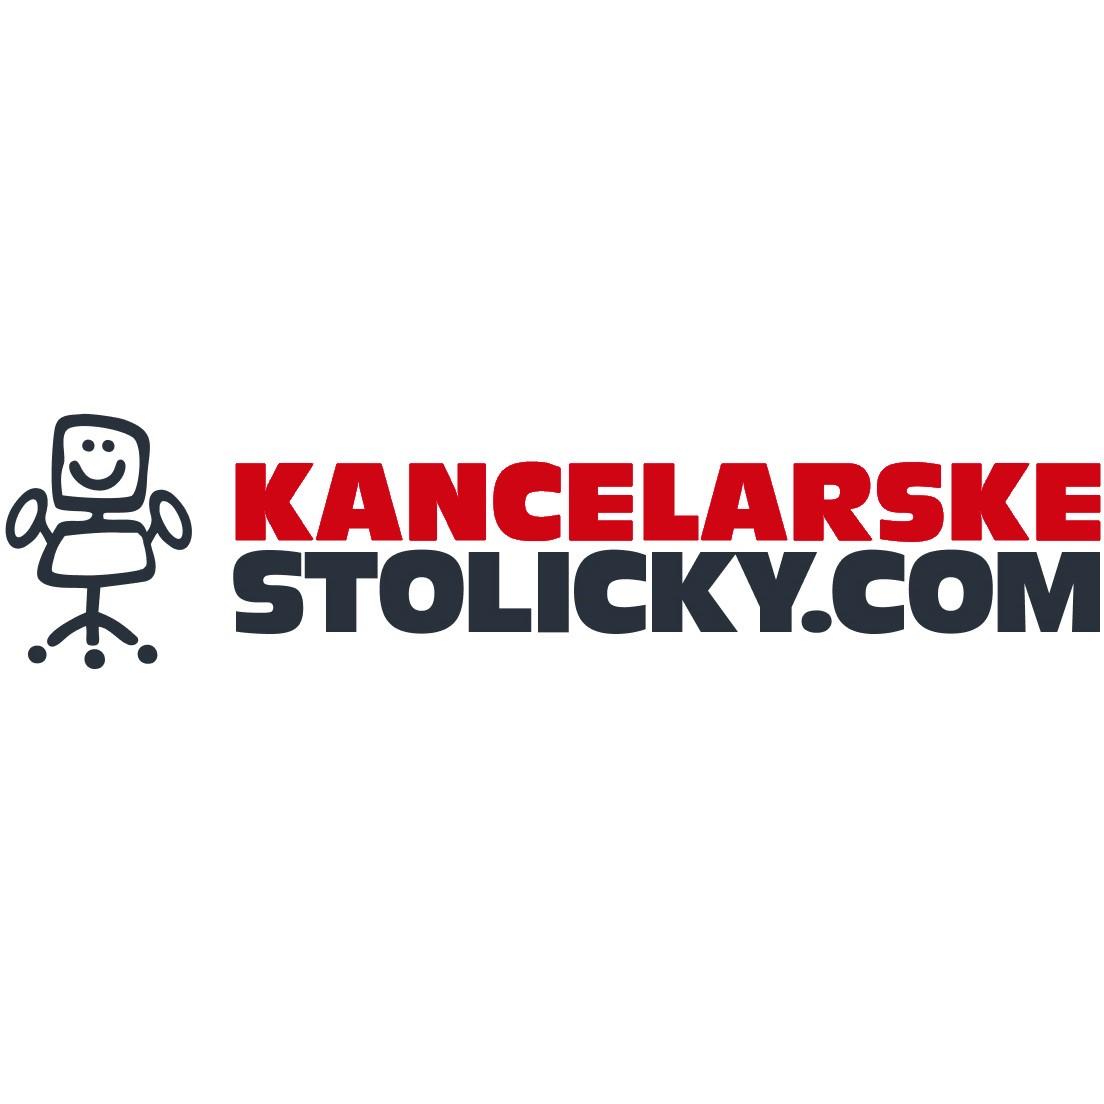 Kancelarskestolicky.com